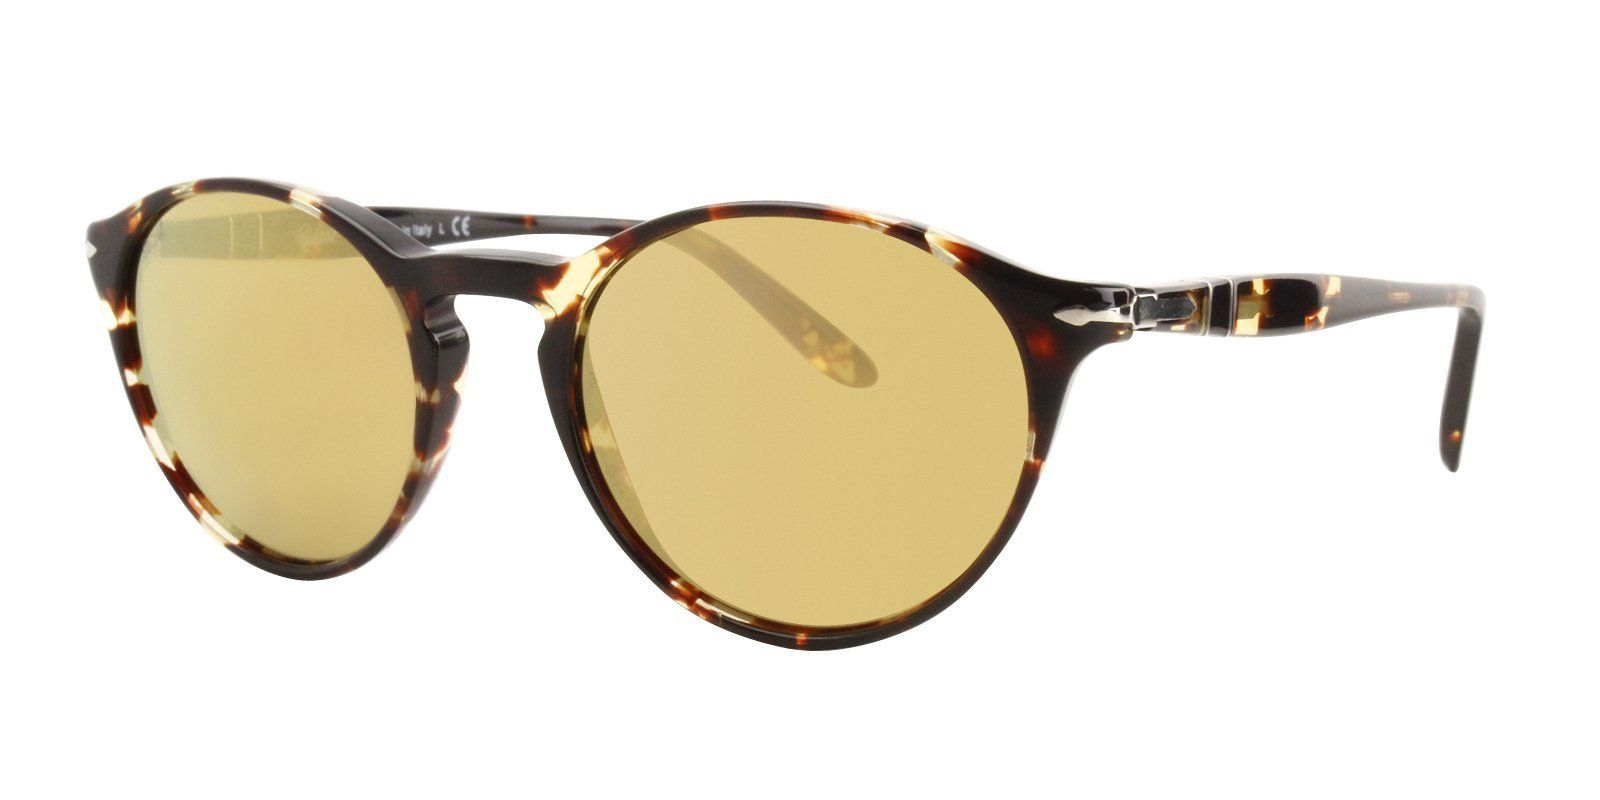 9b66862abc4e4 Persol - PO3092SM Tortoise - Bronze-sunglasses-Designer Eyes ...